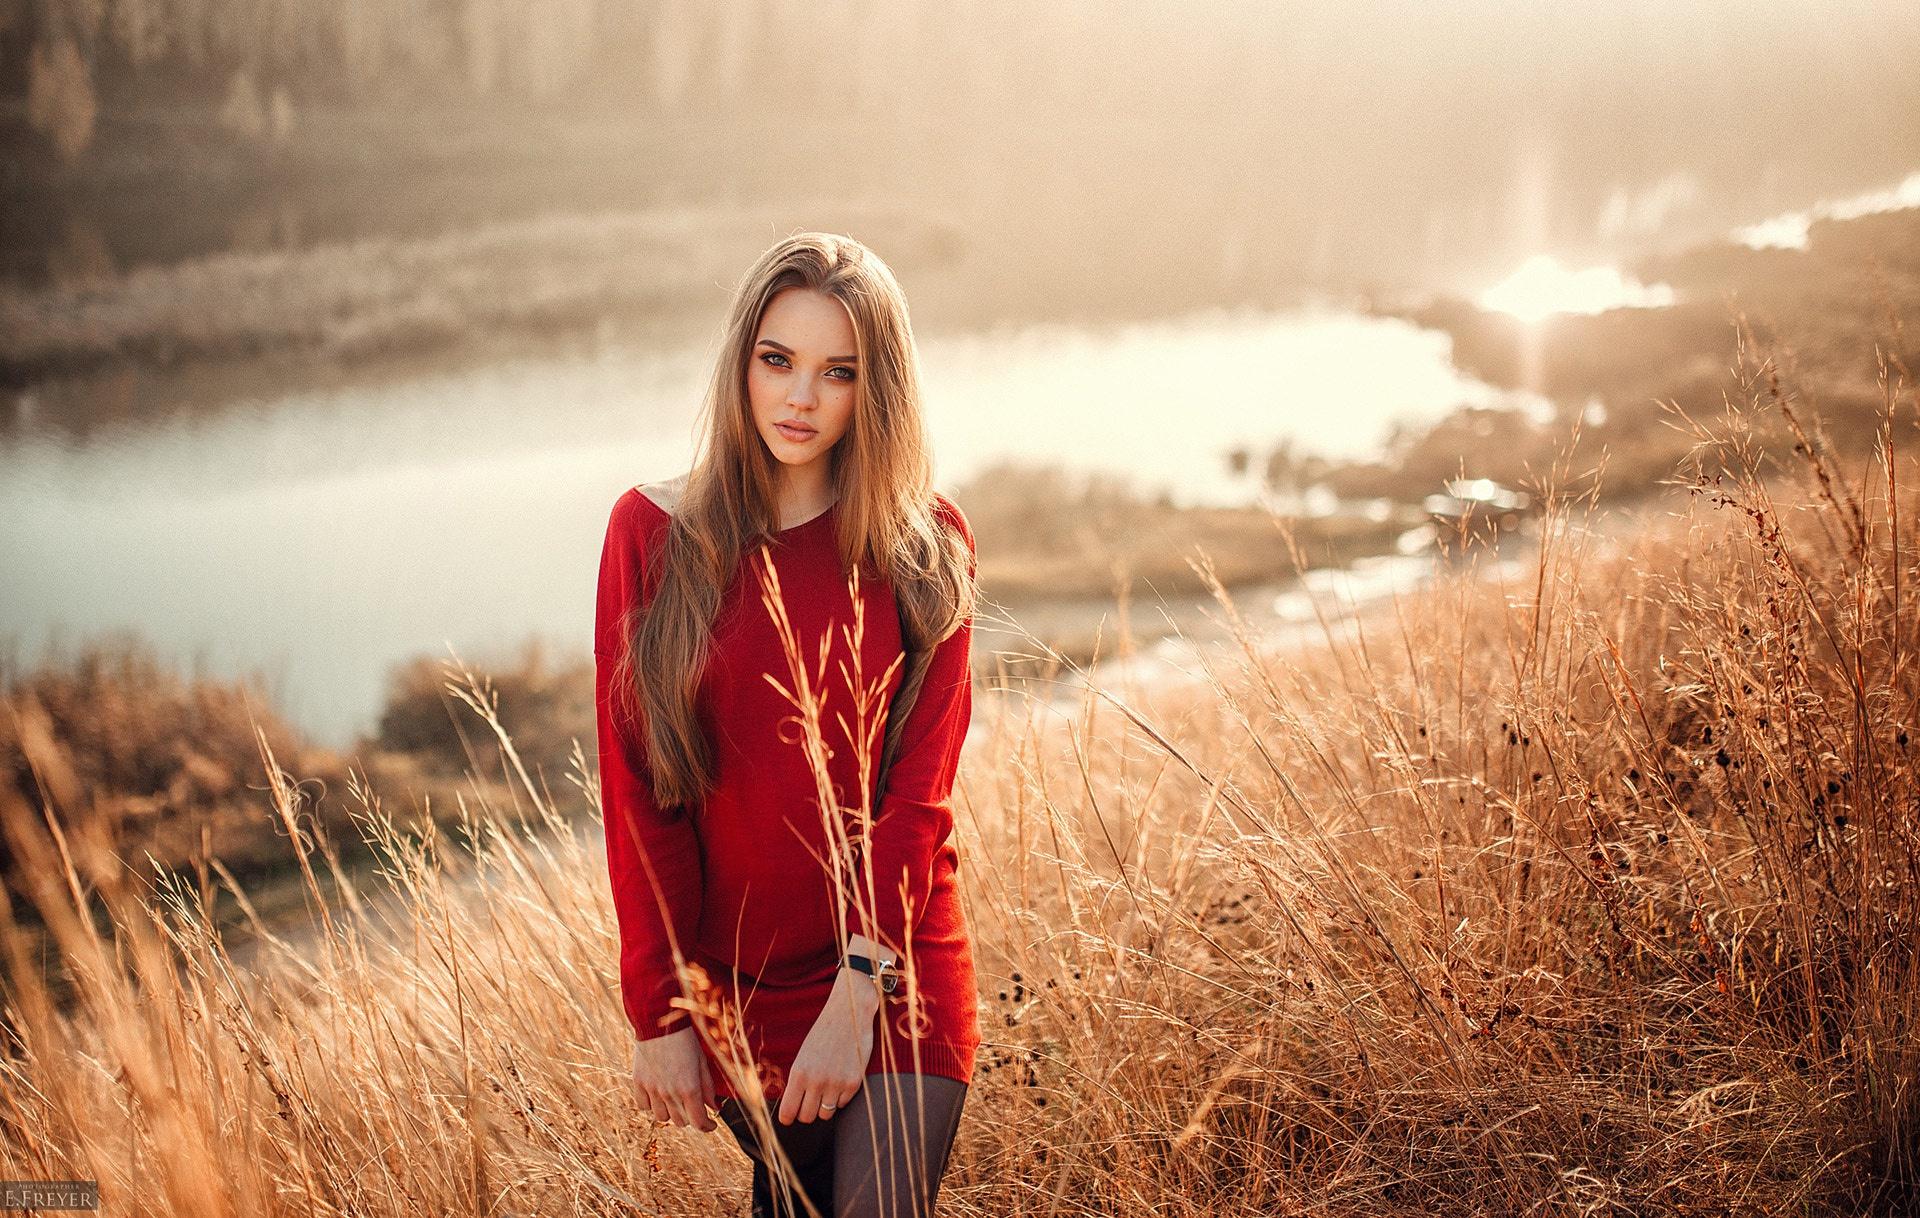 Landscape Grass Bokeh Makeup Evgeny